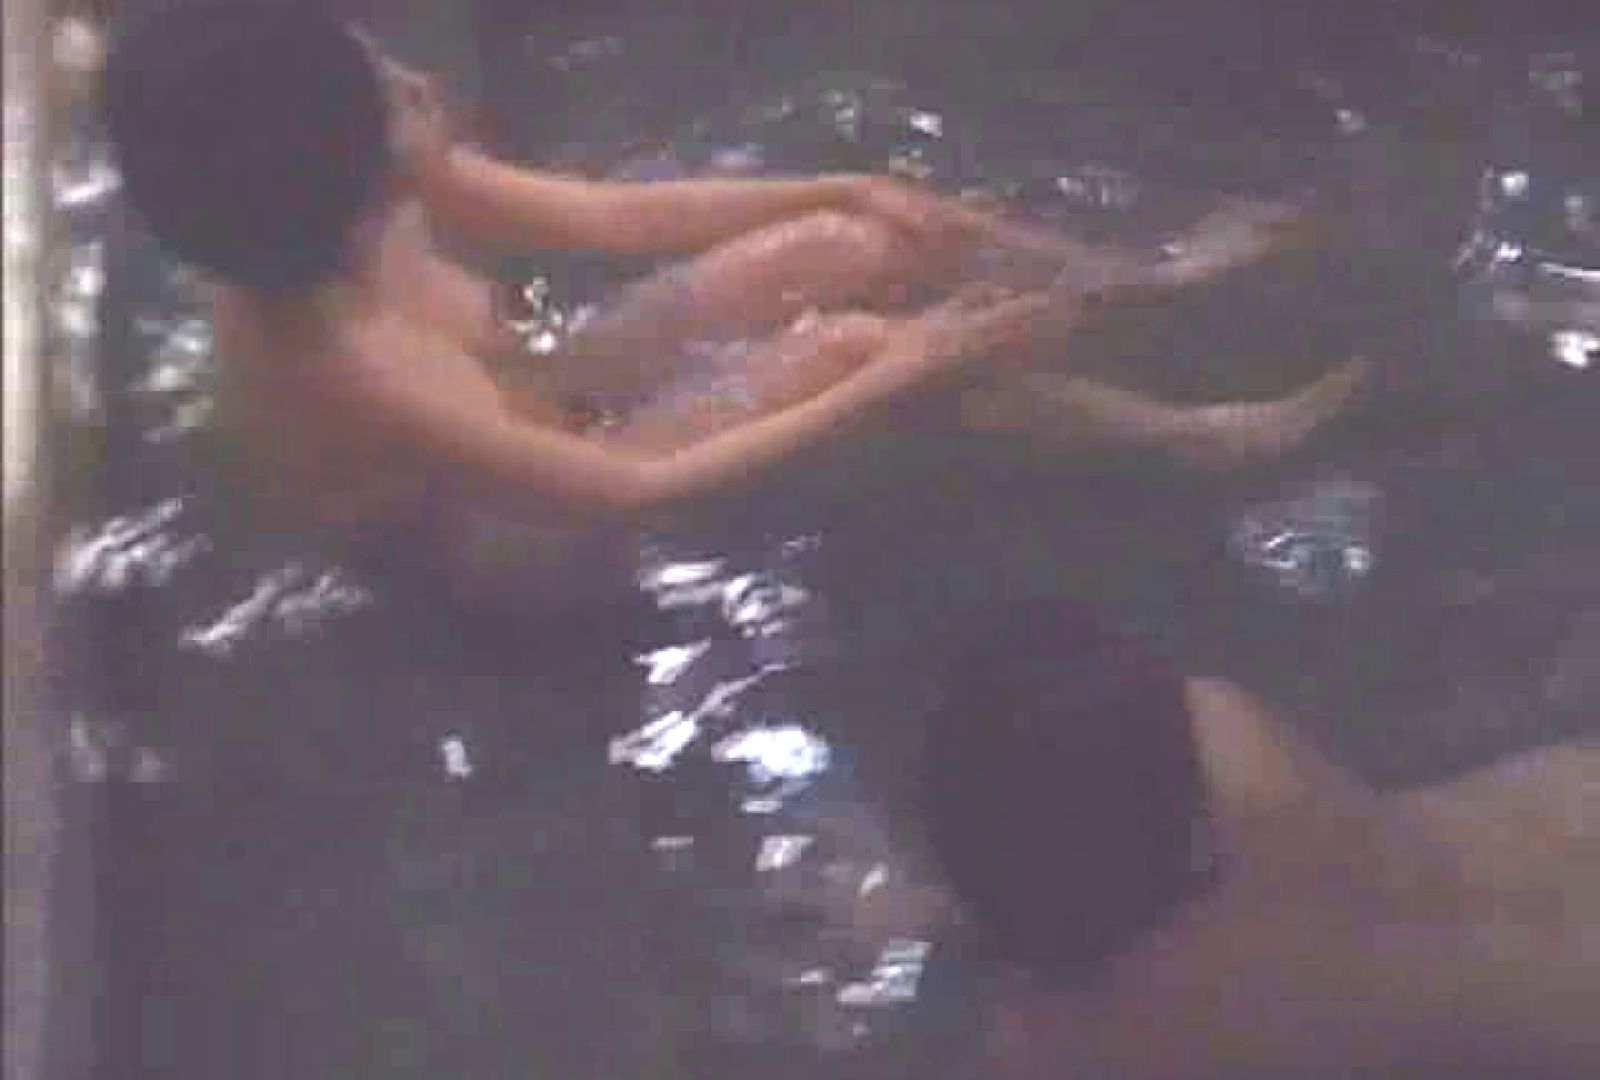 素人投稿シリーズ 盗撮 覗きの穴場 大浴場編 Vol.3 女風呂 性交動画流出 62枚